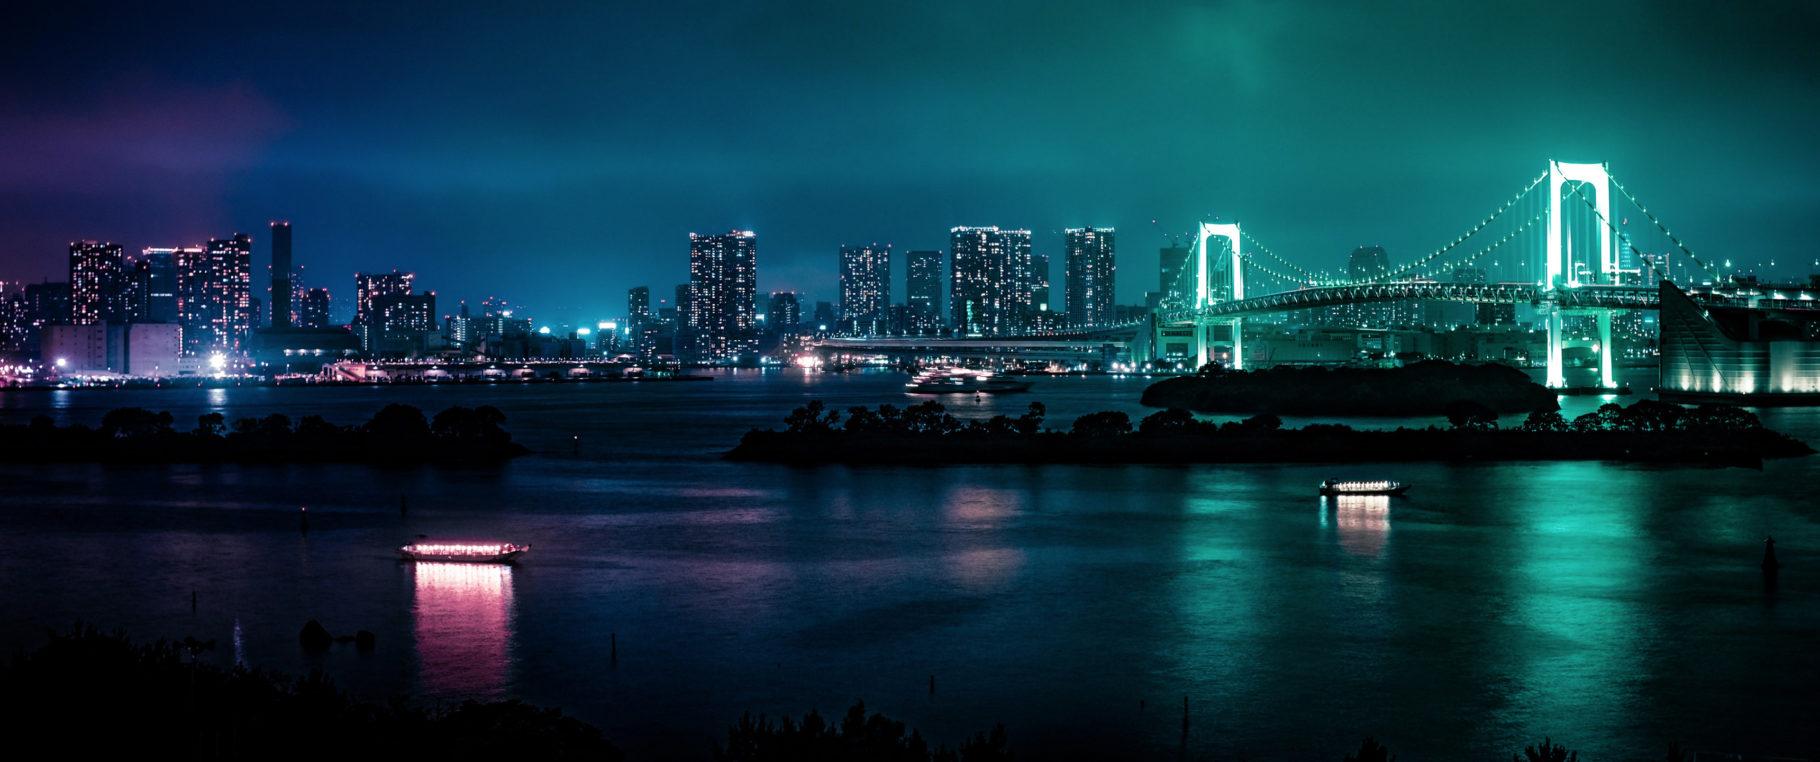 Glowing Bridge (3440×1440 Wallpaper